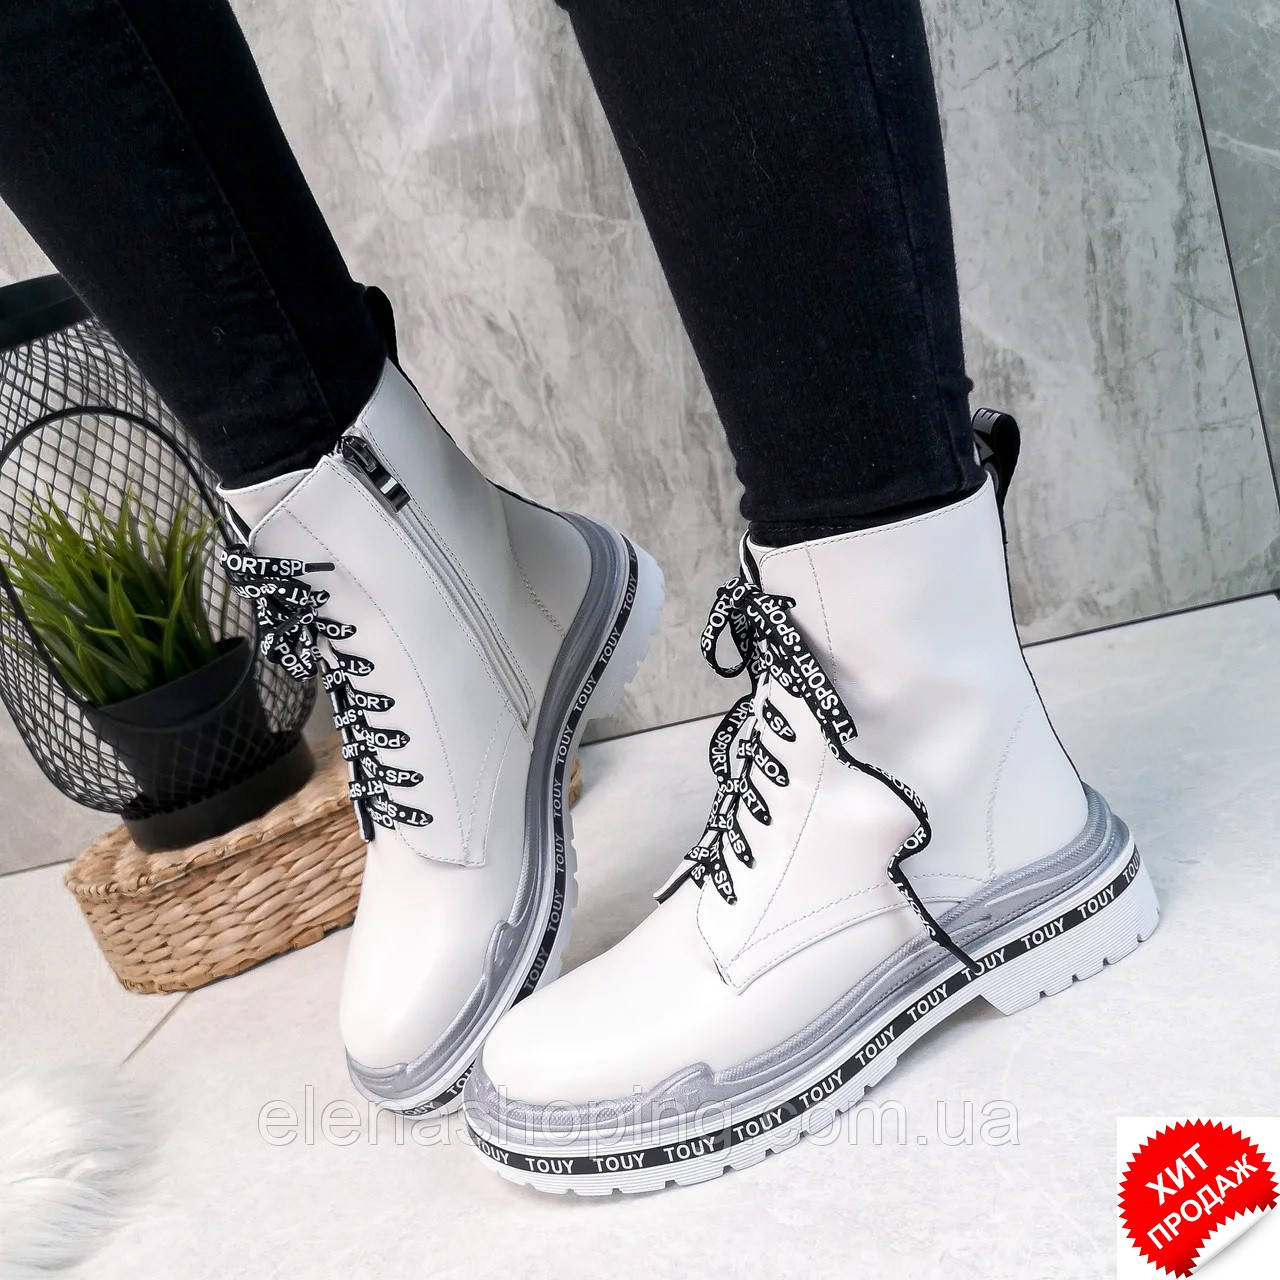 Женские ботинки демисезонные AESD р36-41(код 4500-00)